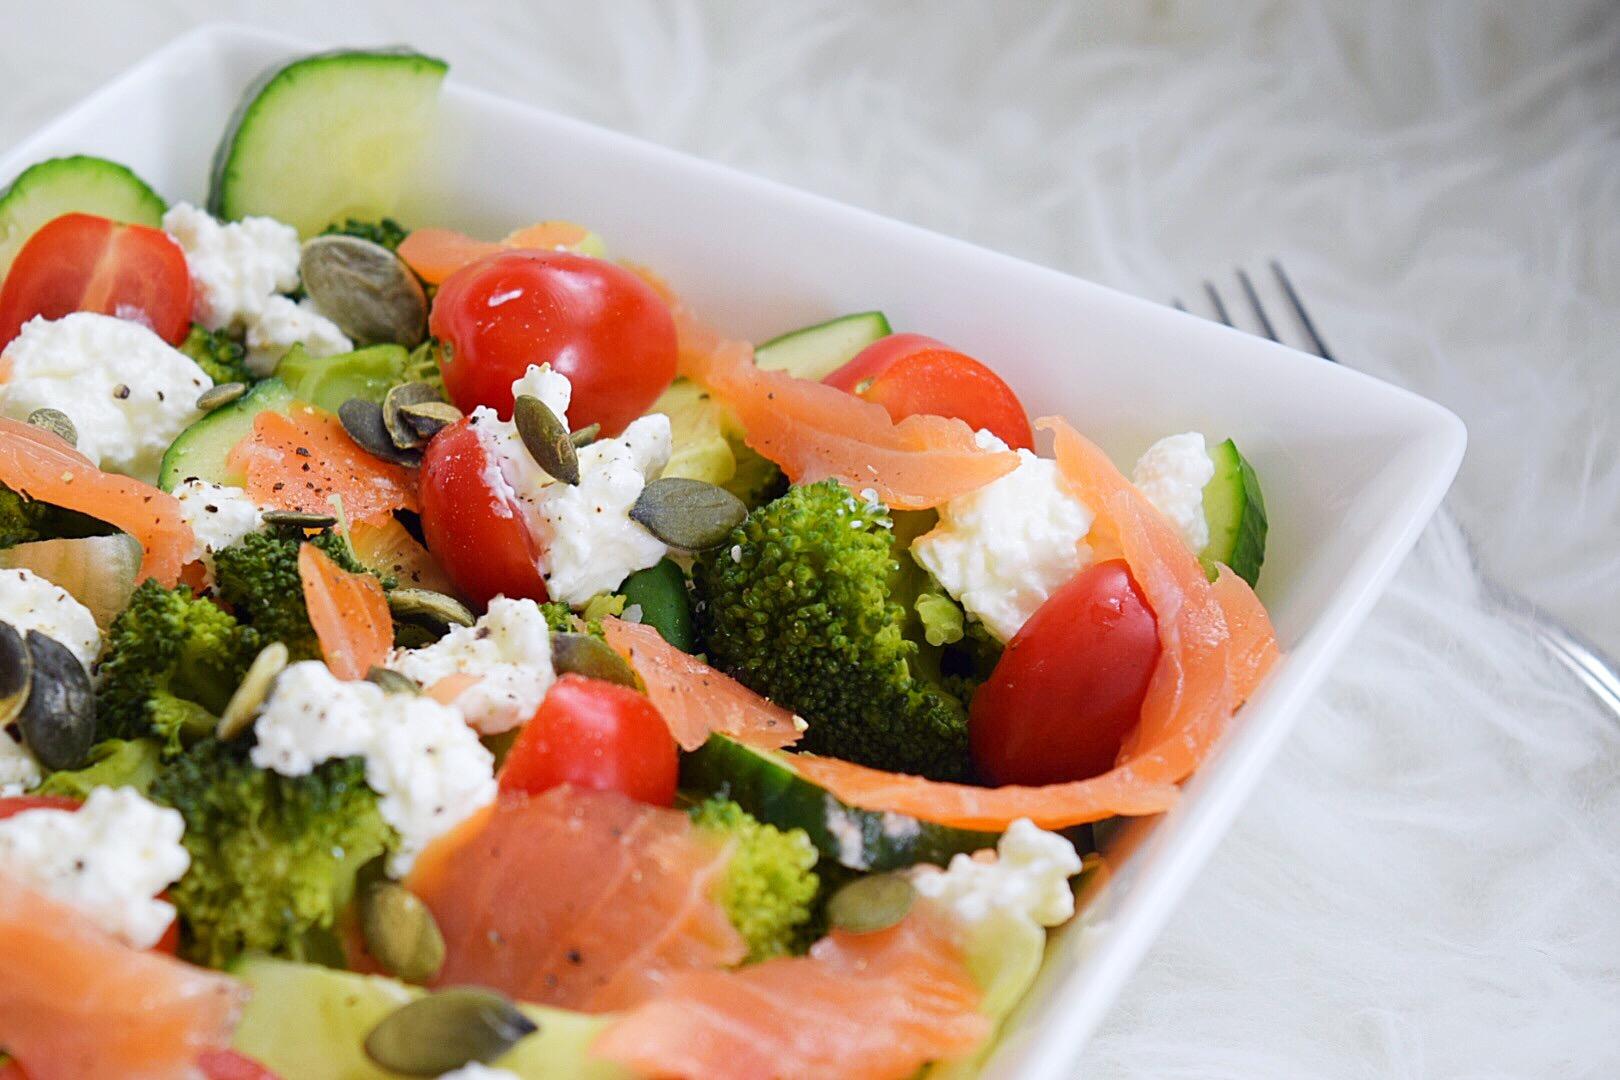 ❤️ Broccoli zalm lunchsalade